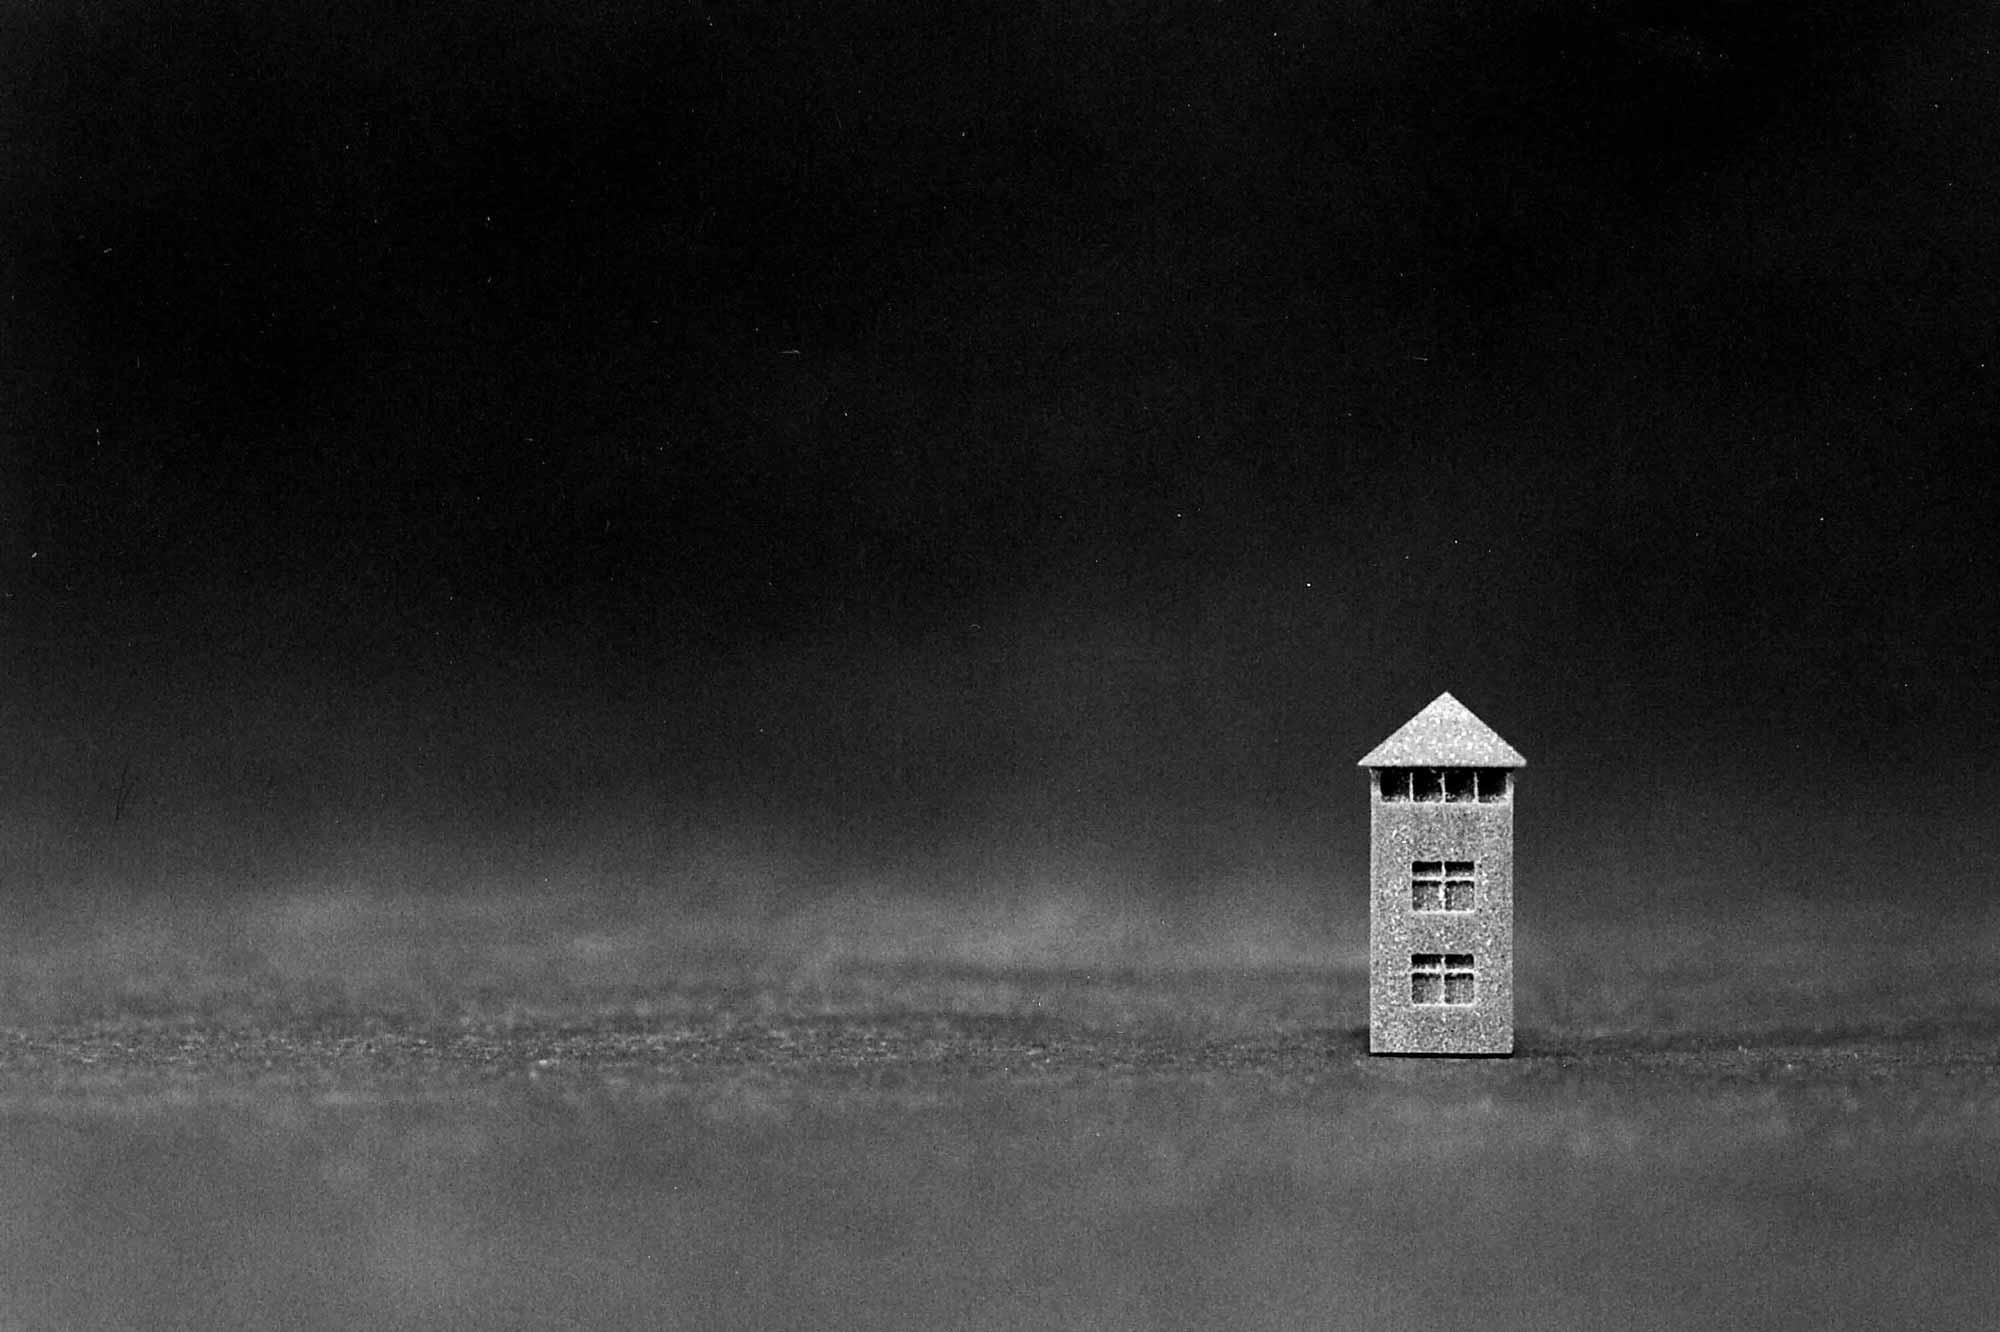 Verhör im Licht, Modell Fotodokumentation, Lagerturm KZ Dachau